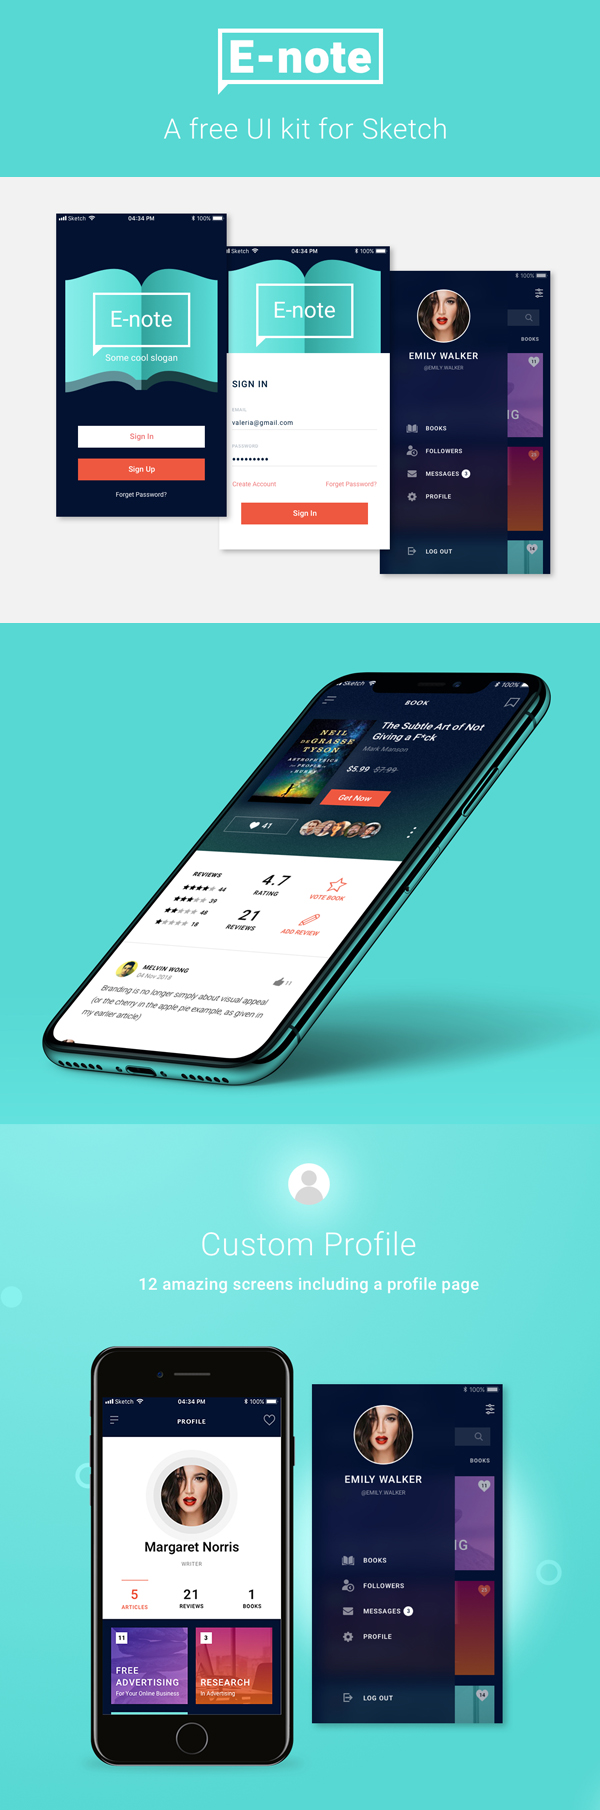 Freebie: E-note UI Kit